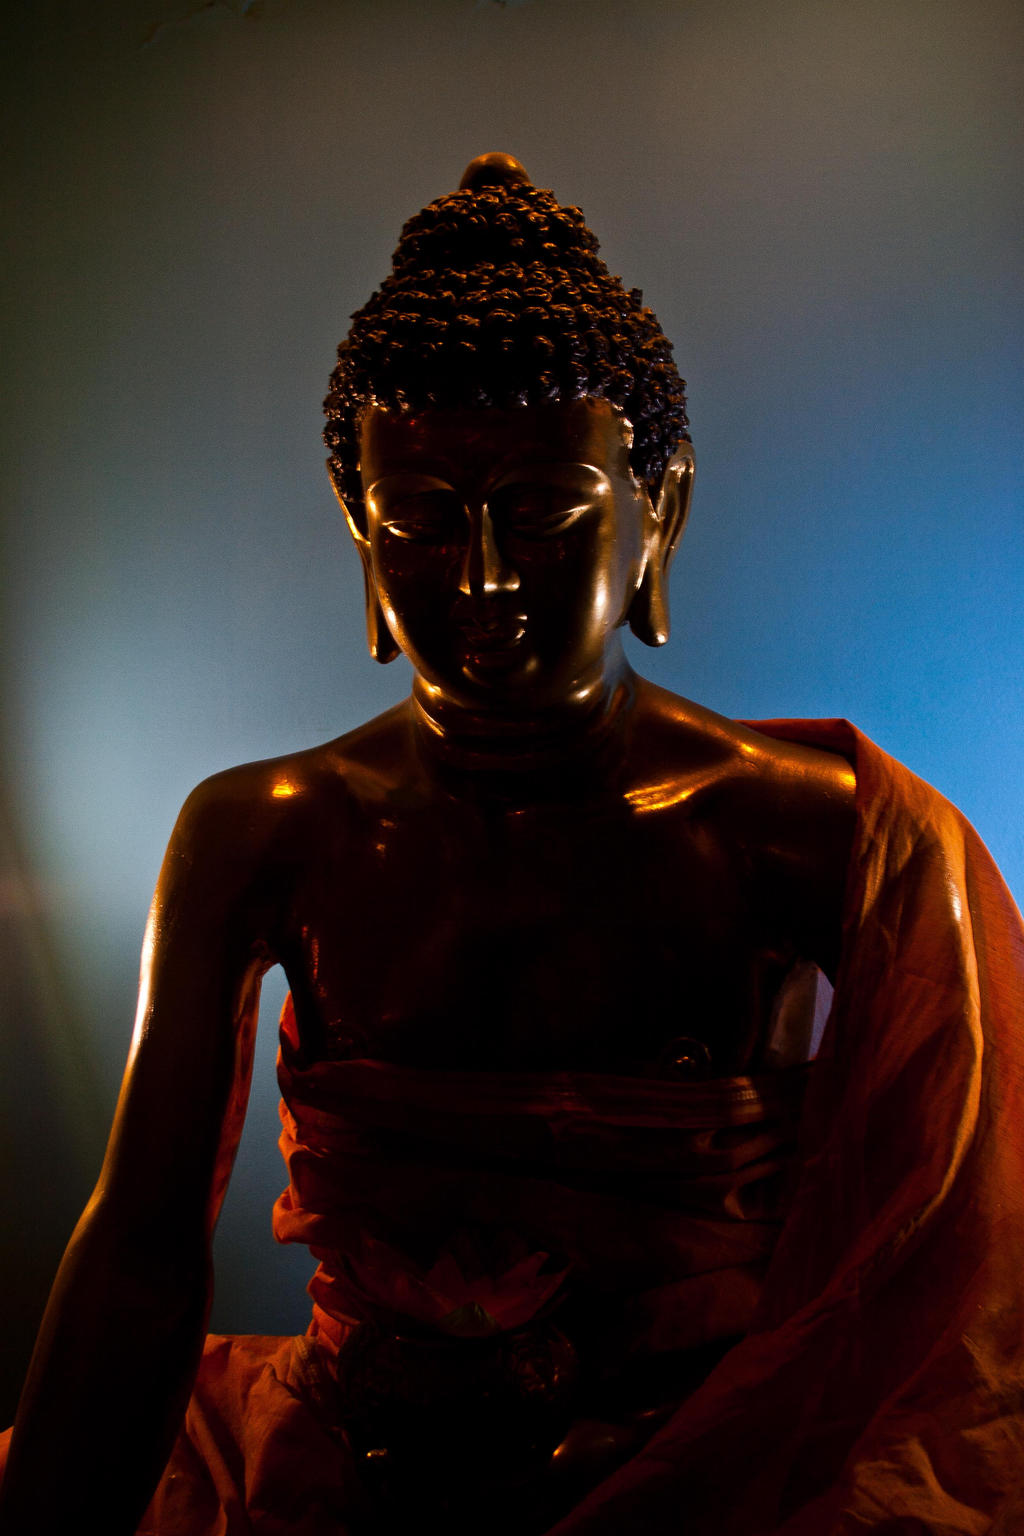 Der Goldenn Buddha teapub in Almaty by sarikreal